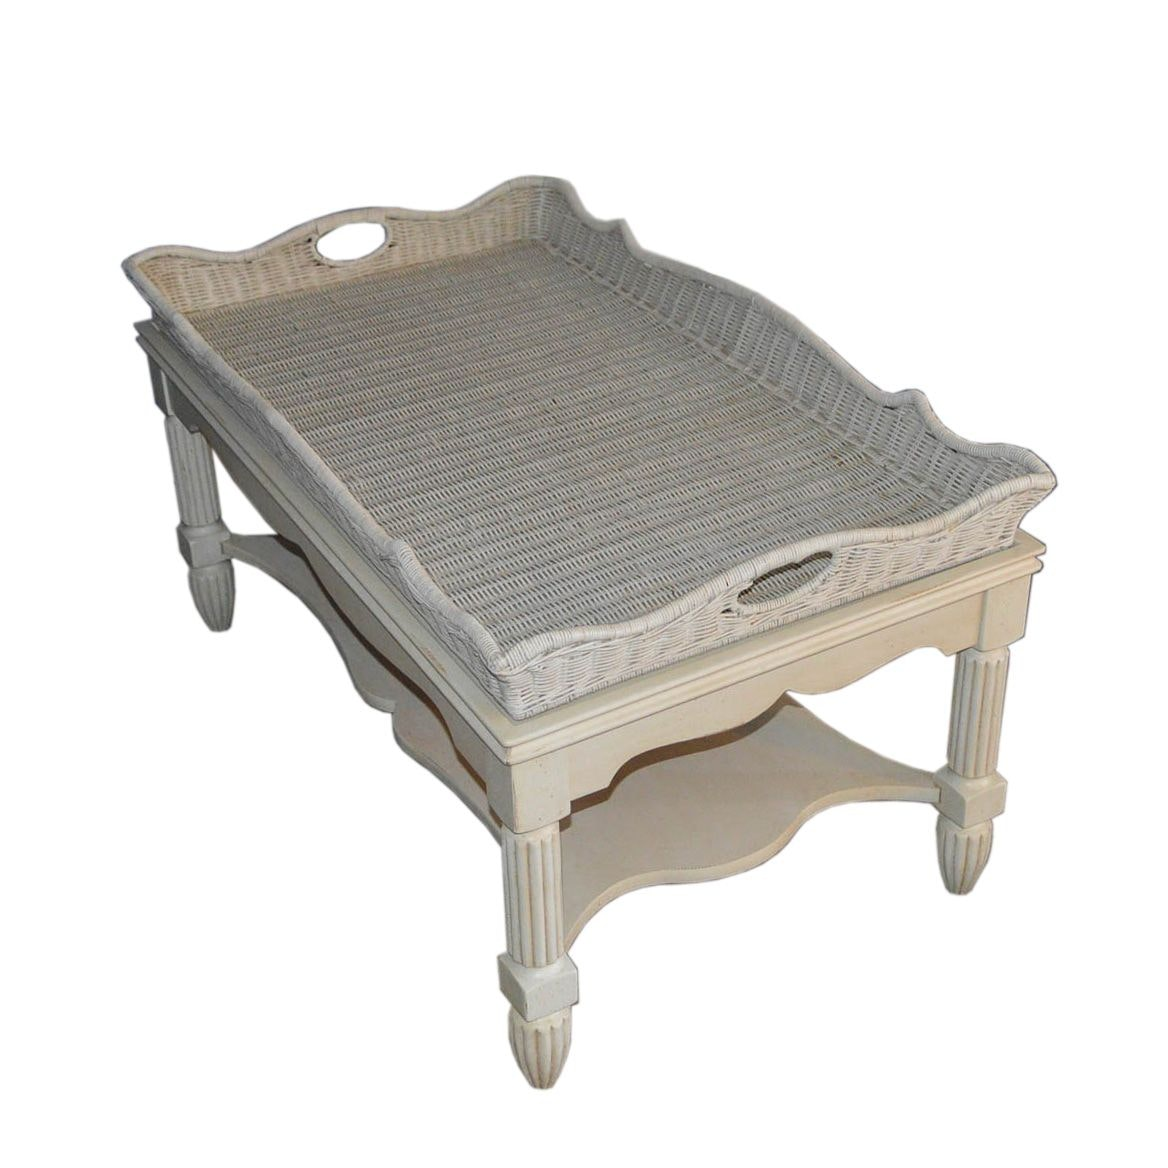 Wicker Tray Coffee Table